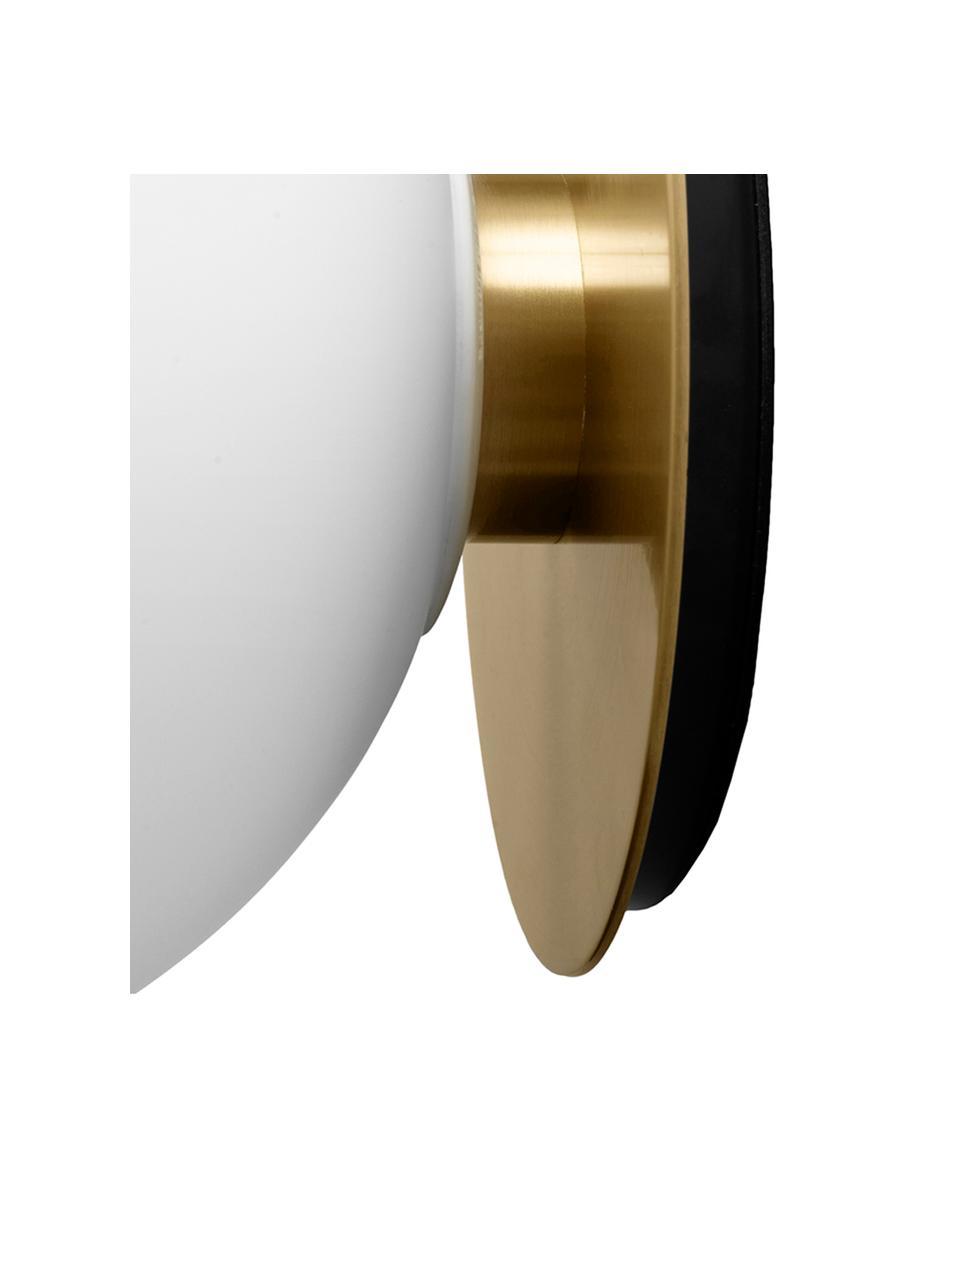 LED-Wand- und Deckenleuchte TR Bulb, Lampenschirm: Opalglas, Messingfarben, Ø 20 x T 22 cm